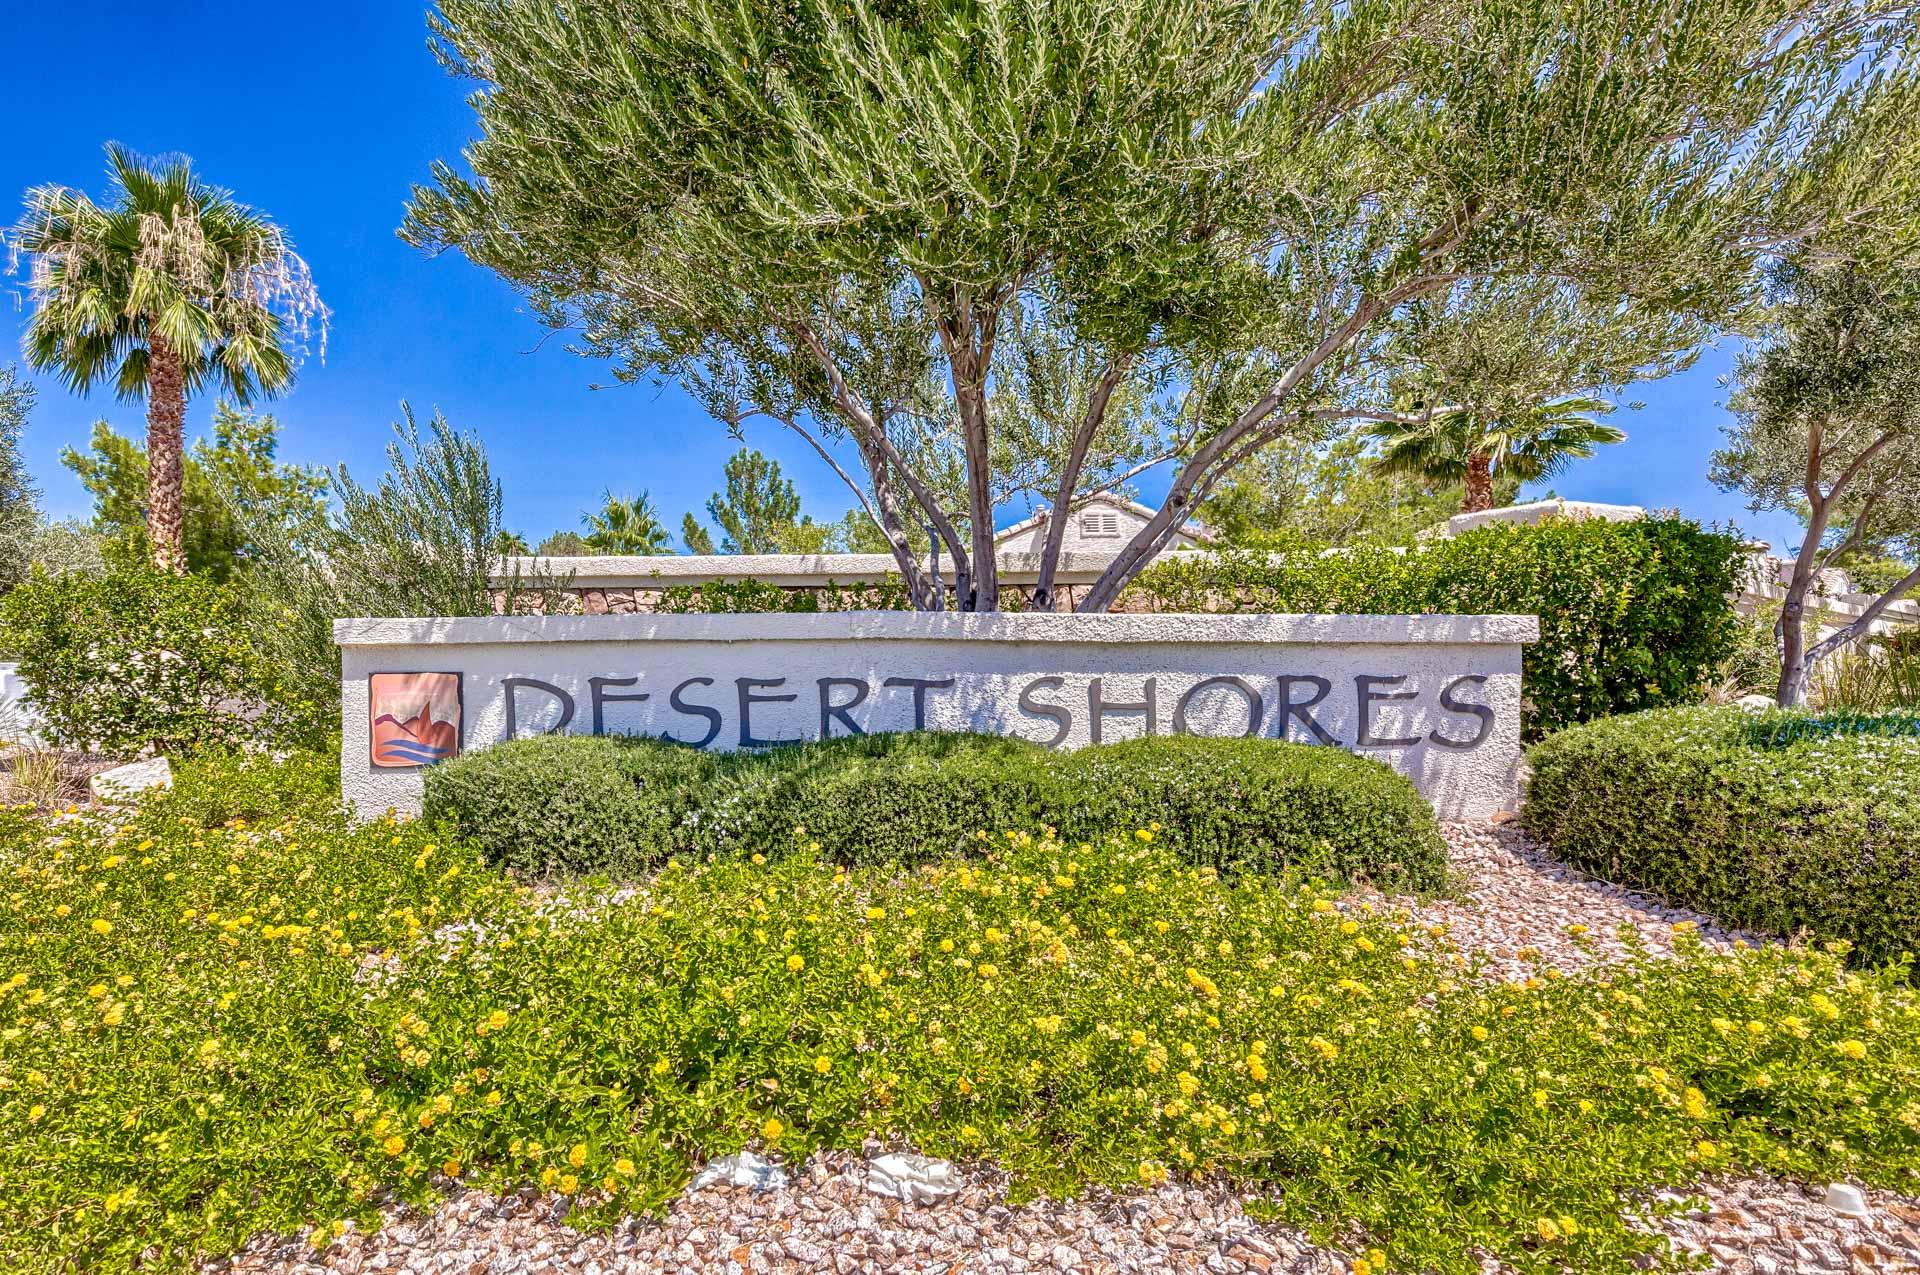 Desert Shores Las Vegas 4 - LasVegasRealEstate.com